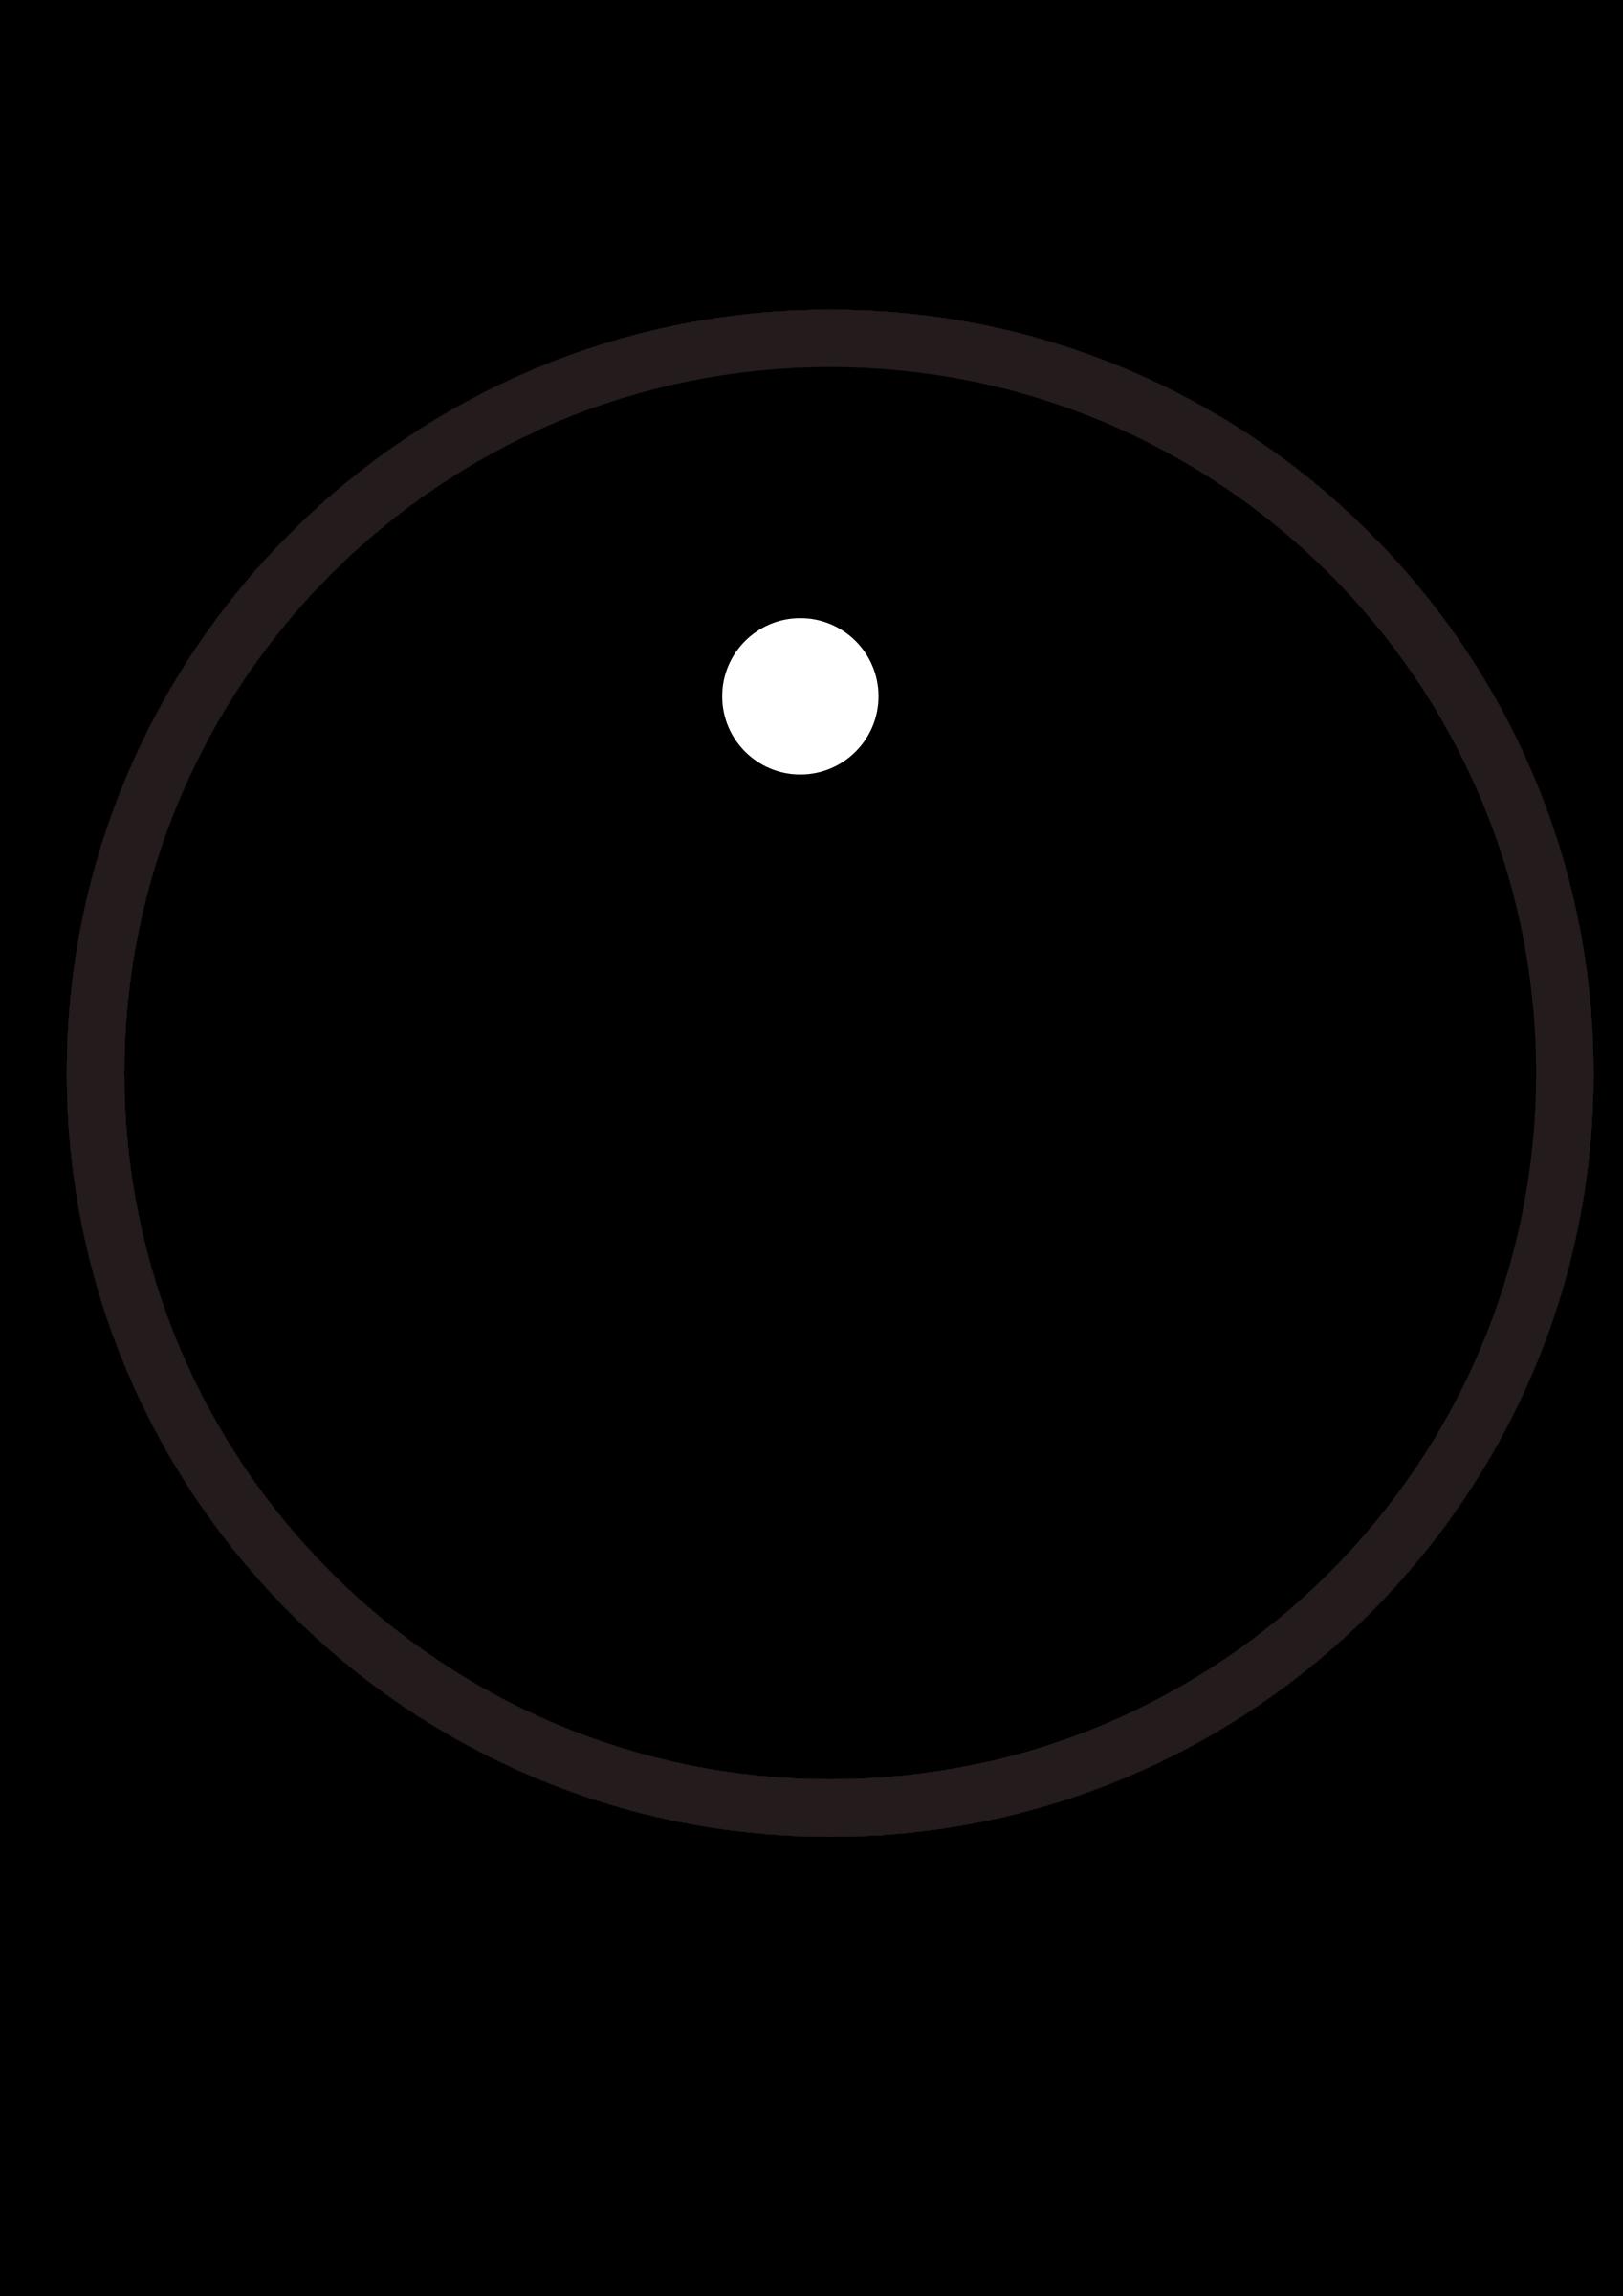 Clipart - Yin-Yang